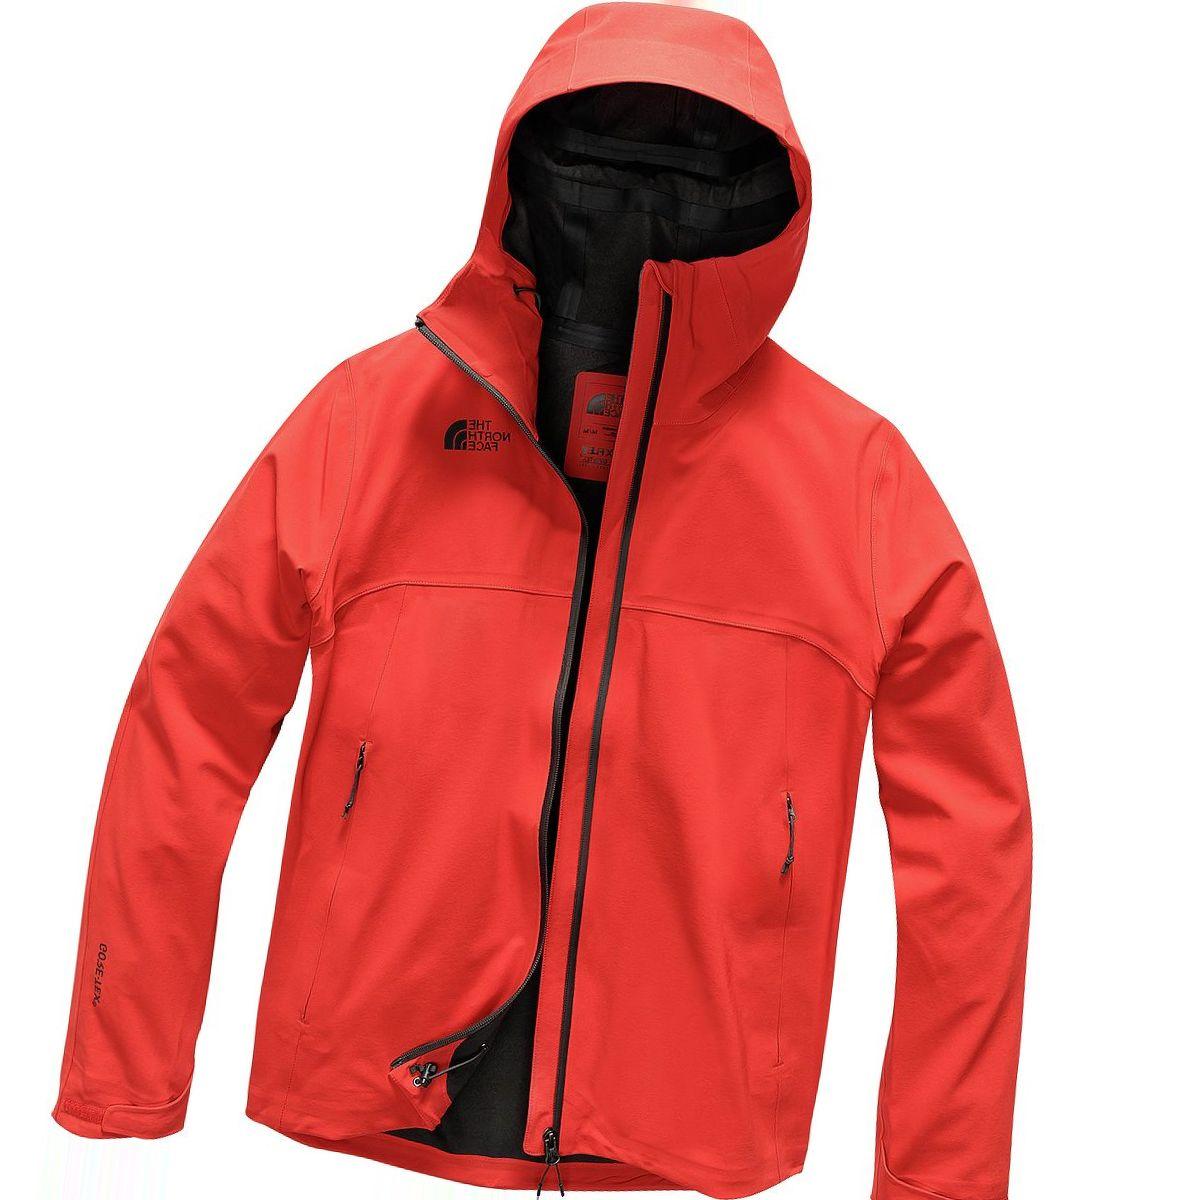 The North Face Apex Flex GTX 3.0 Jacket - Men's